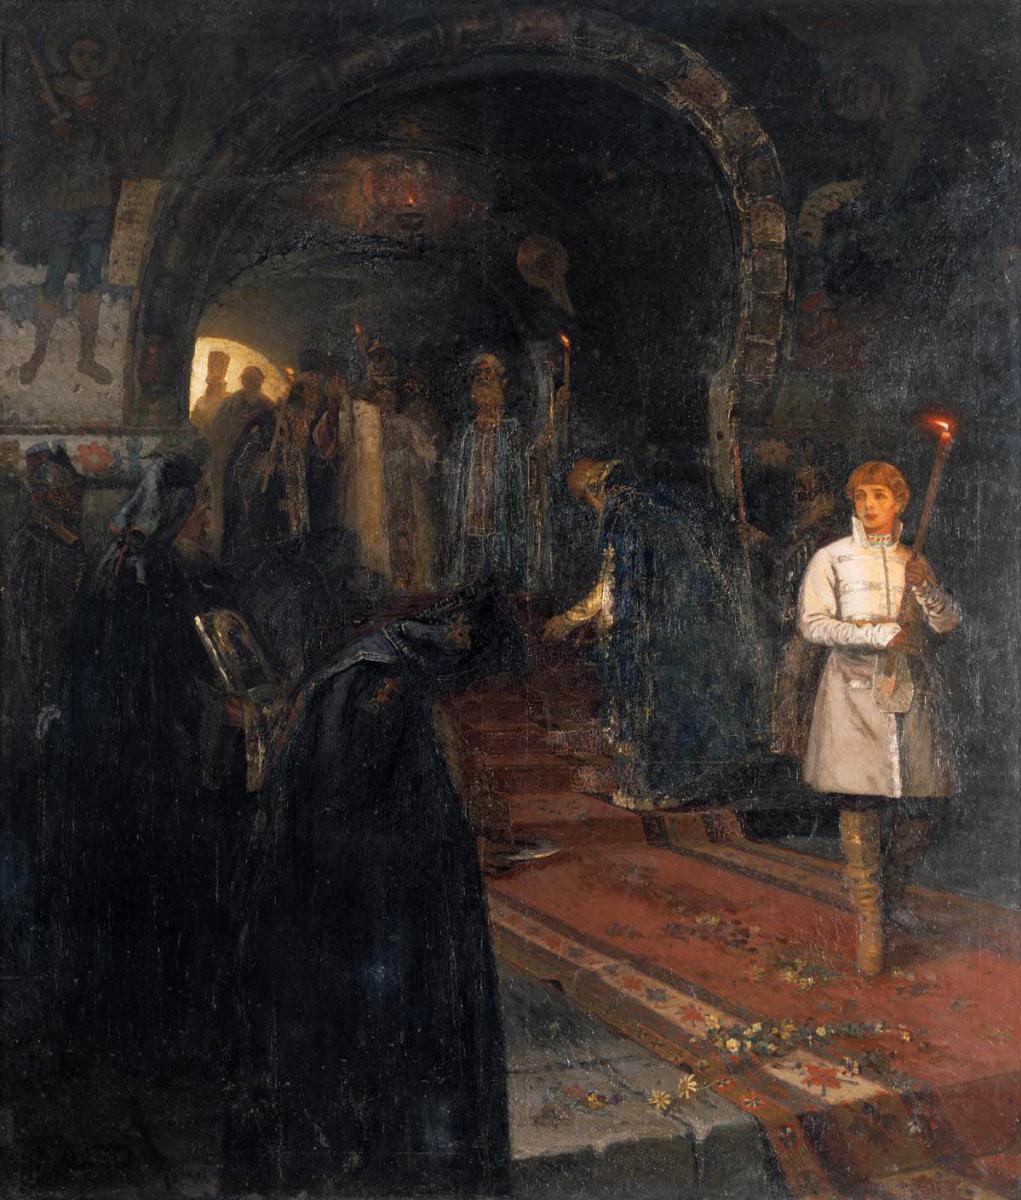 Mikhail Vasilyevich Nesterov. To the sovereign of celebitchy